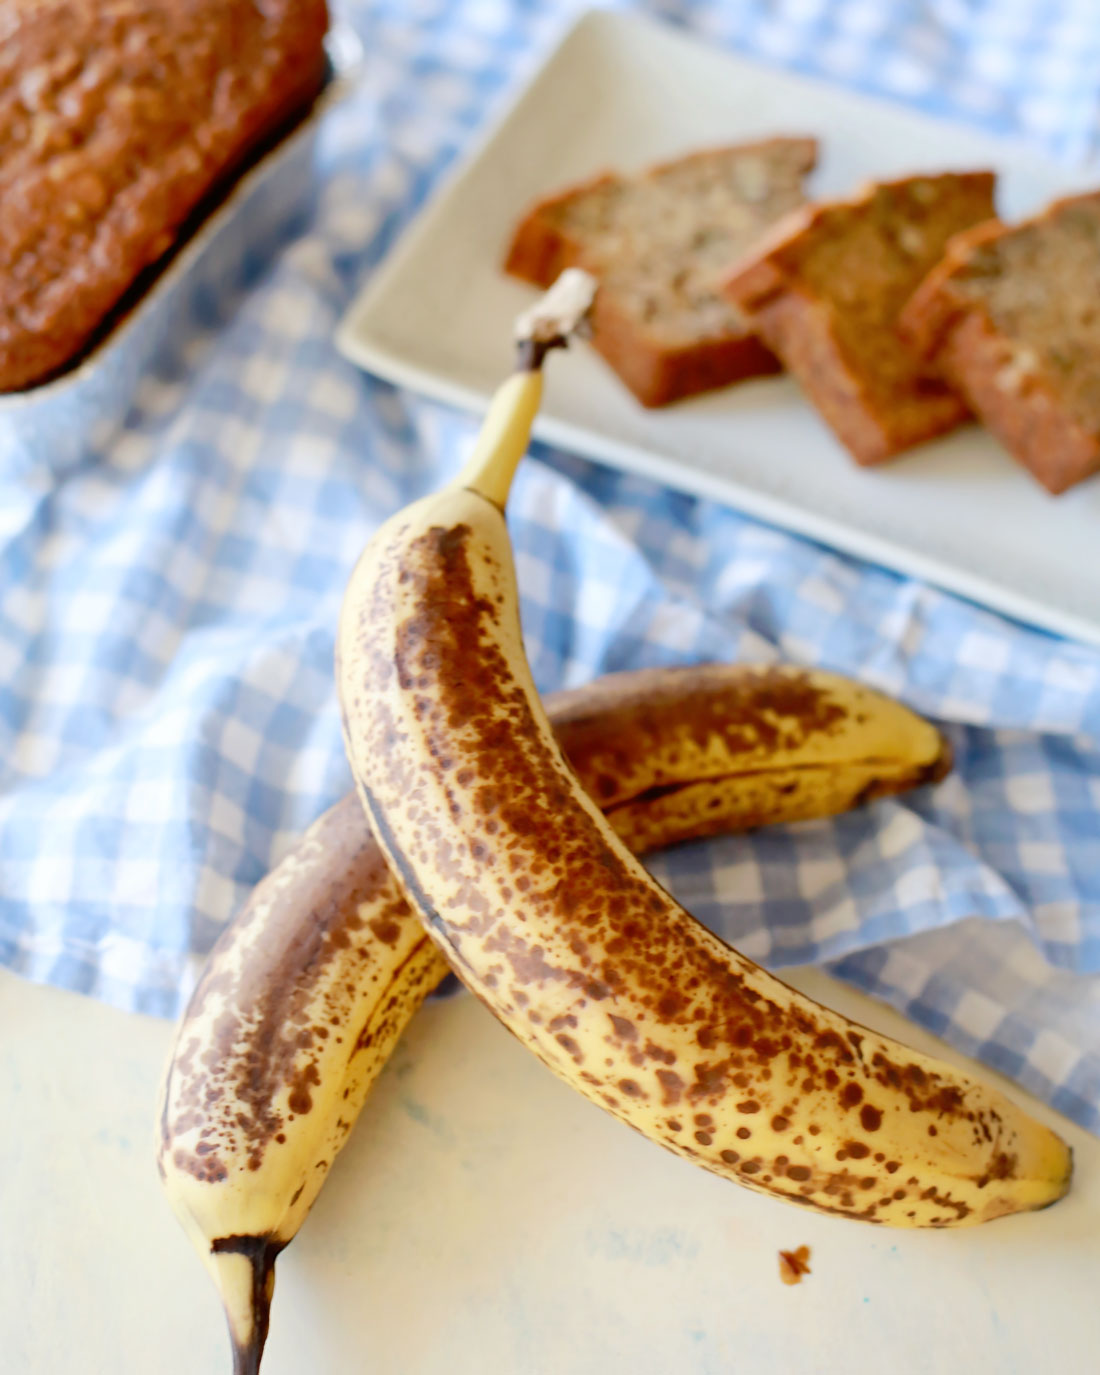 bananas for the best banana bread ever!